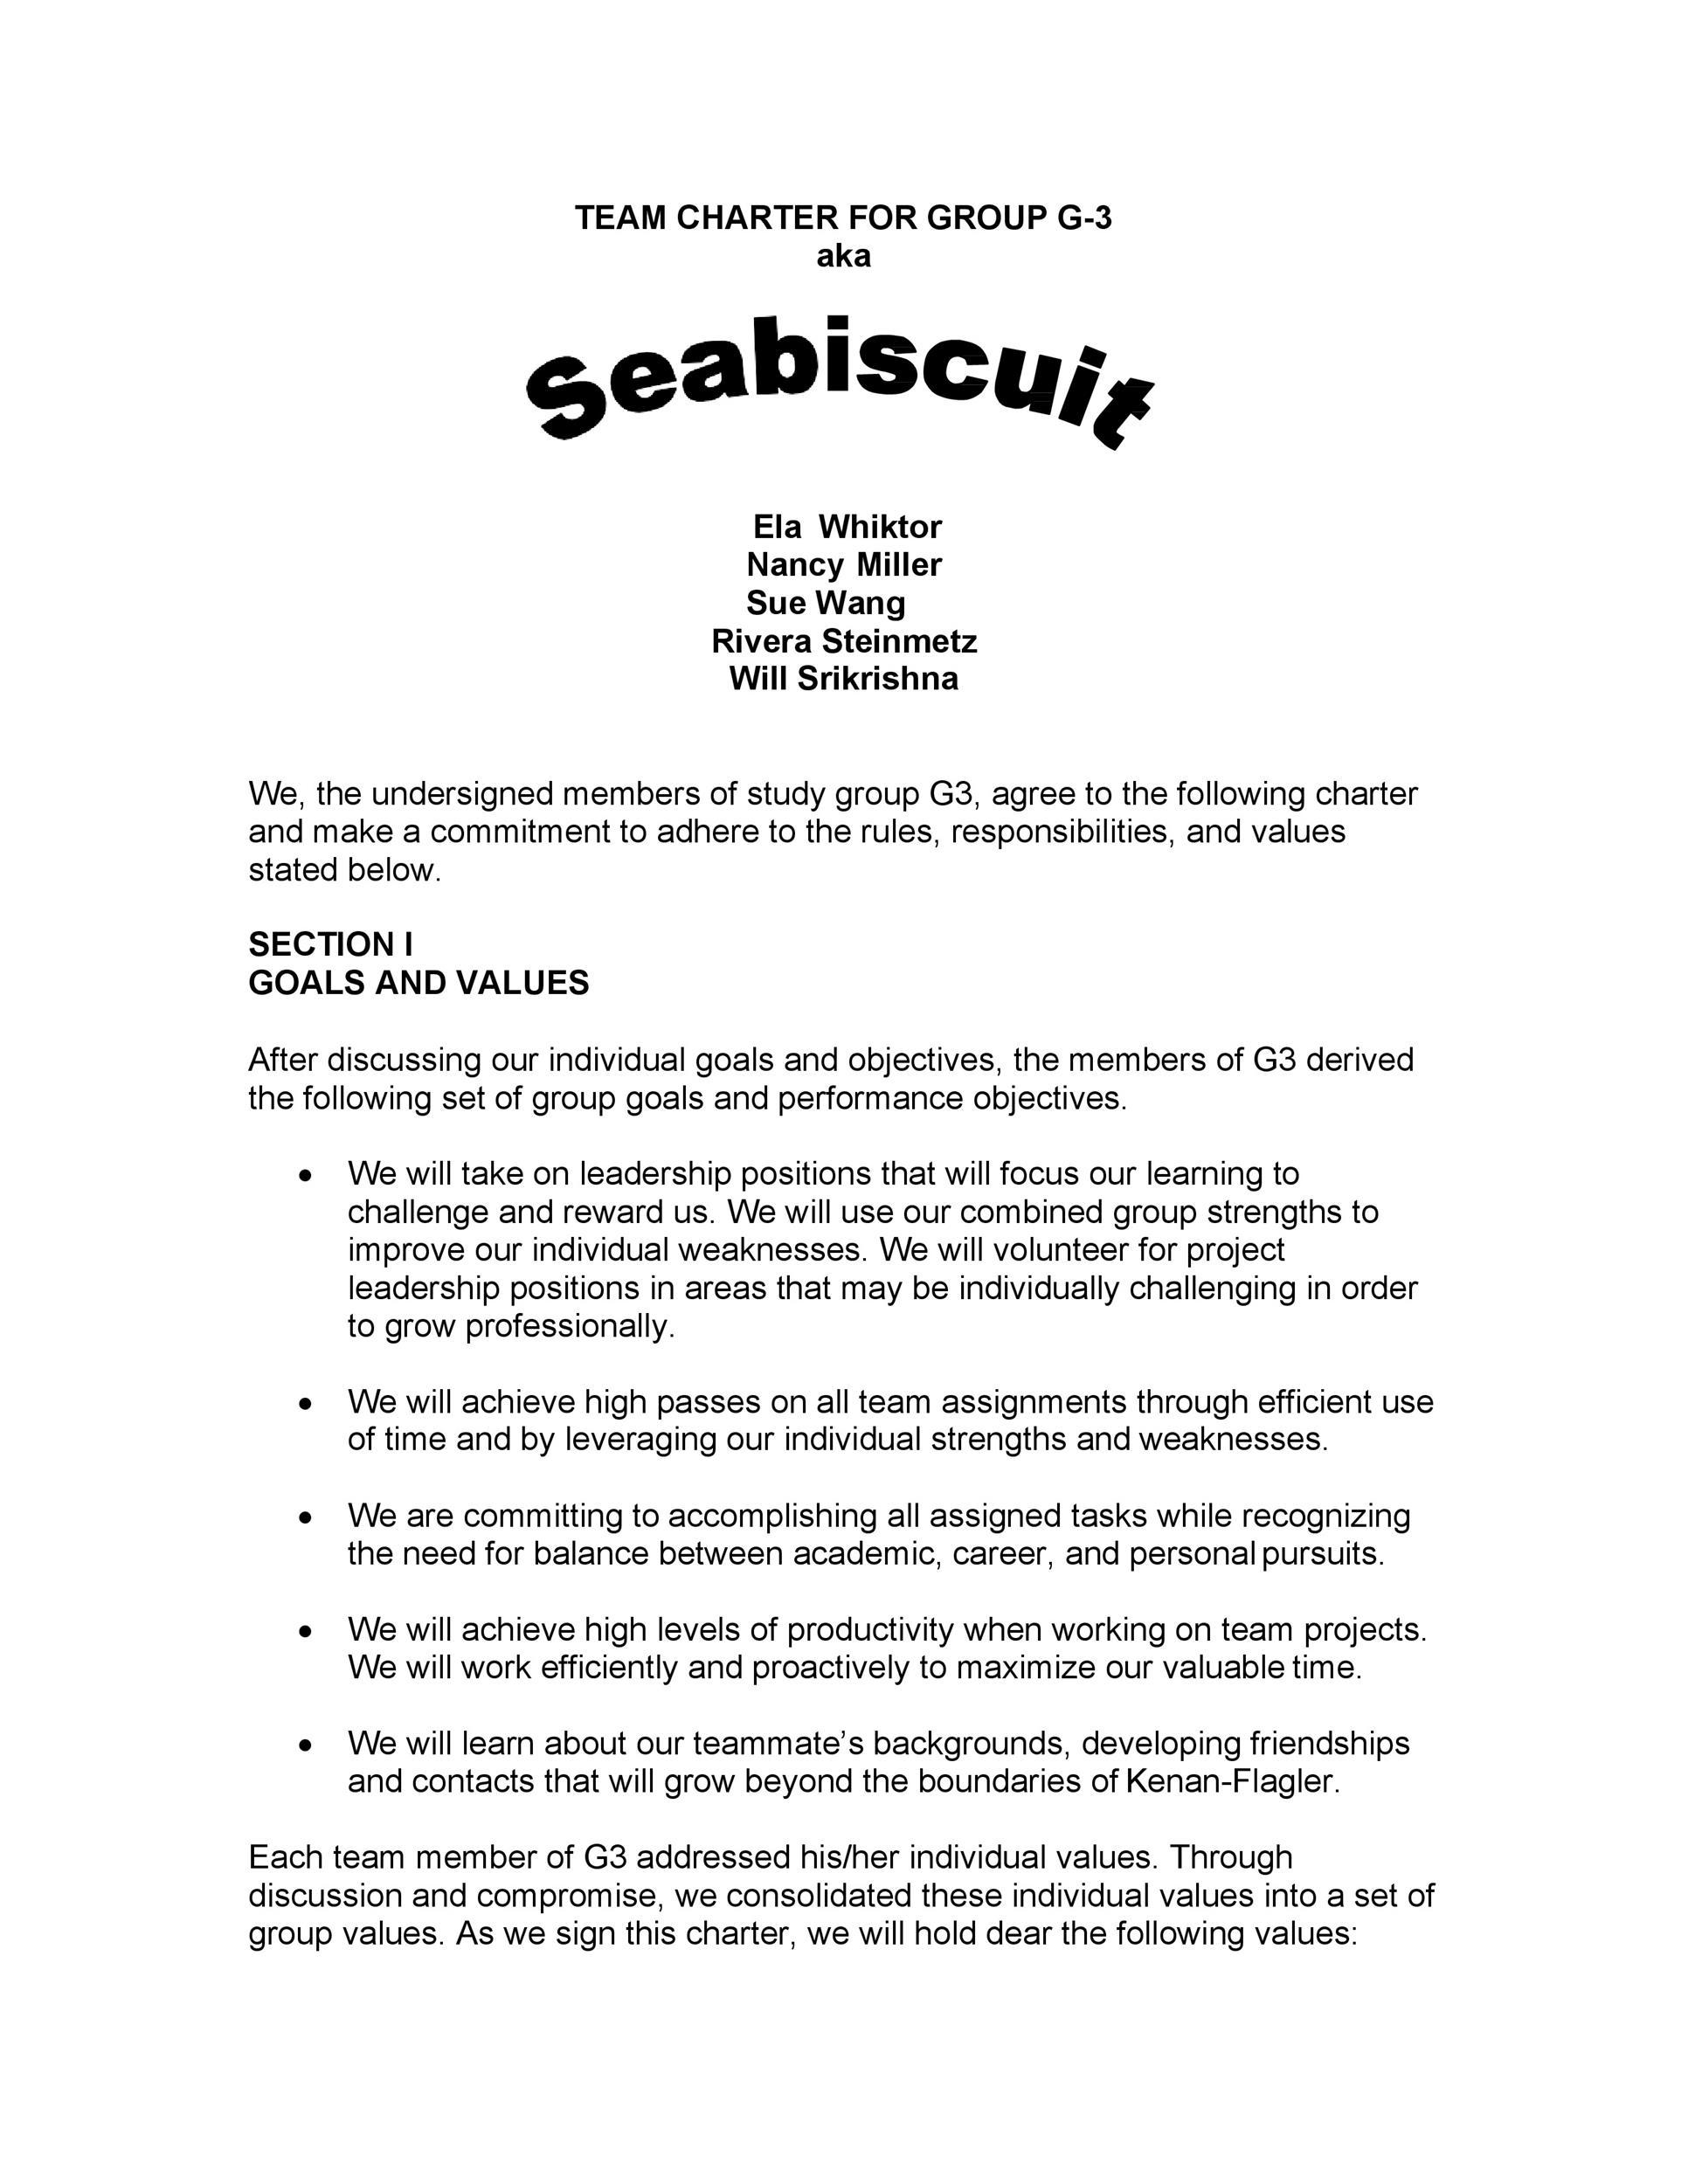 Free team charter template 24